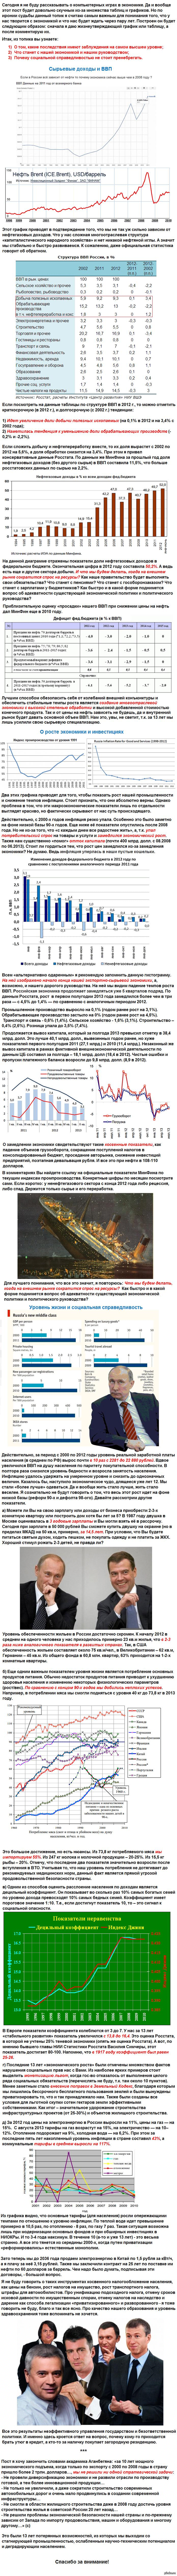 """Утилизация России"". Об экономическом росте. ДЛИННОПОСТ В ответ на еще одну дискуссию. Вернее, на один комментарий   - <a href=""http://pikabu.ru/story/kha_kha_kha__ssha_kinuli_germaniyu_za_zoloto_1480377#comment_14930333"">#comment_14930333</a>"